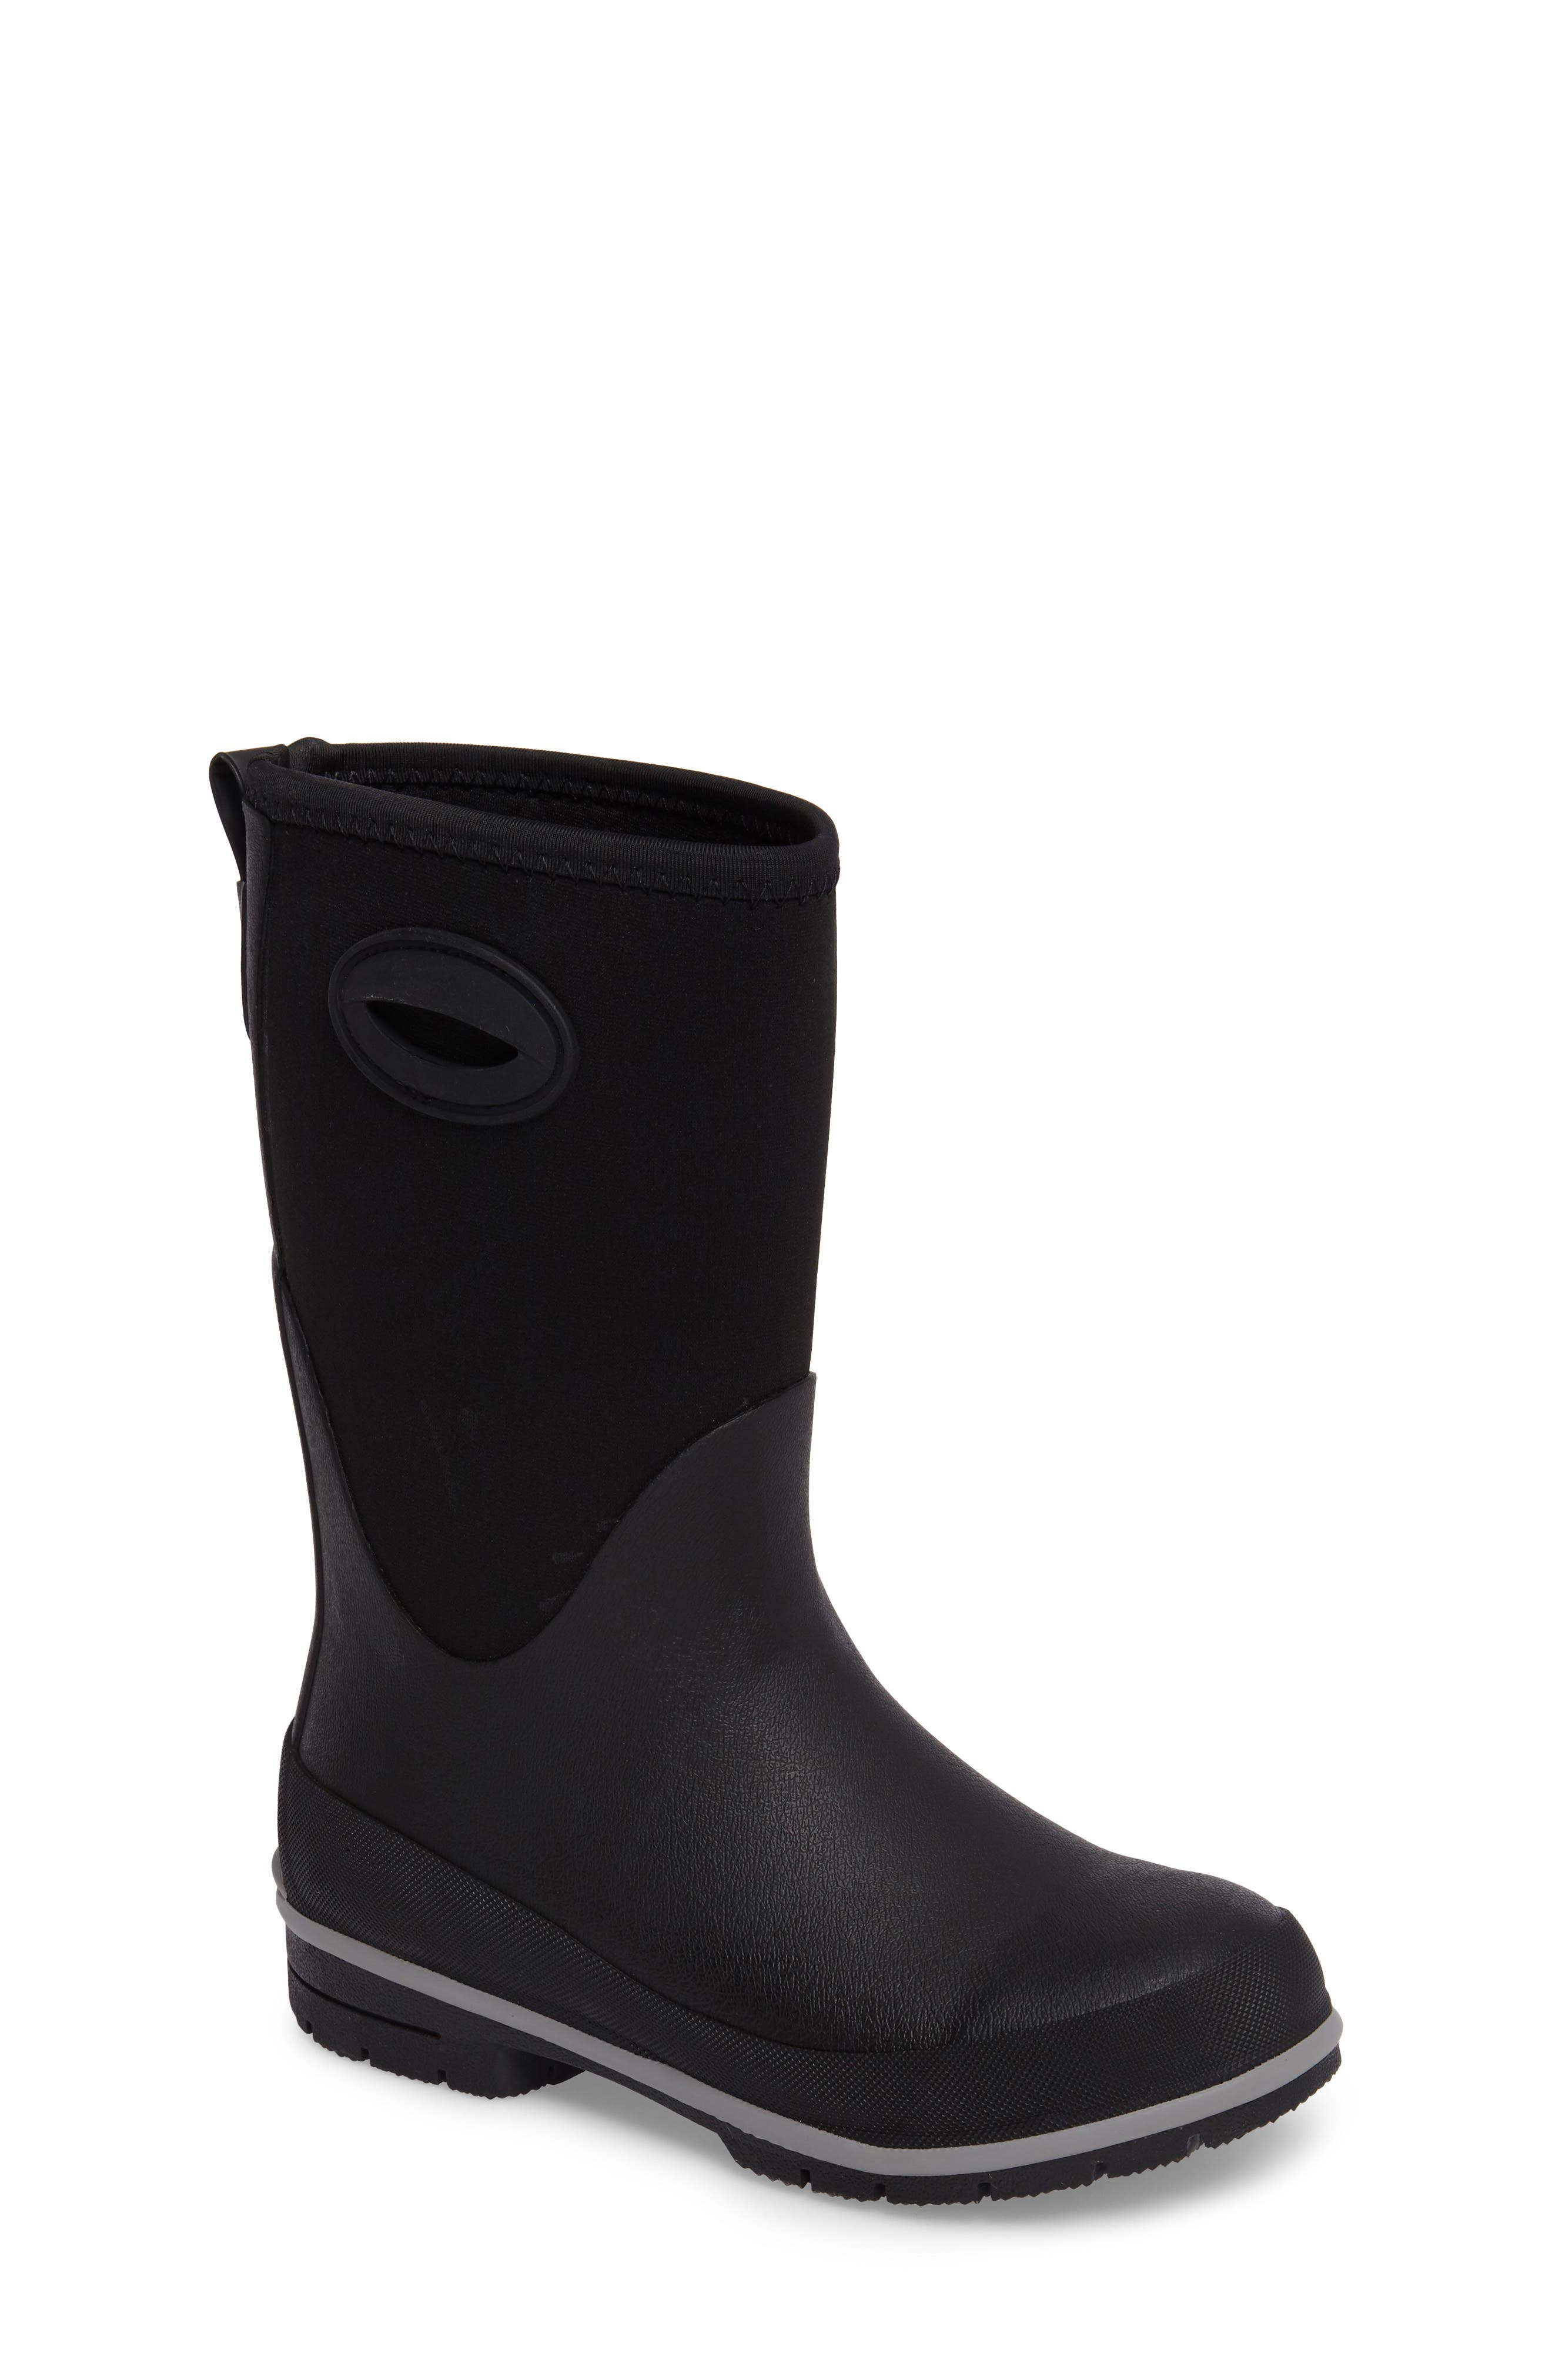 Neoprene Insulated Boot,                             Main thumbnail 1, color,                             Black